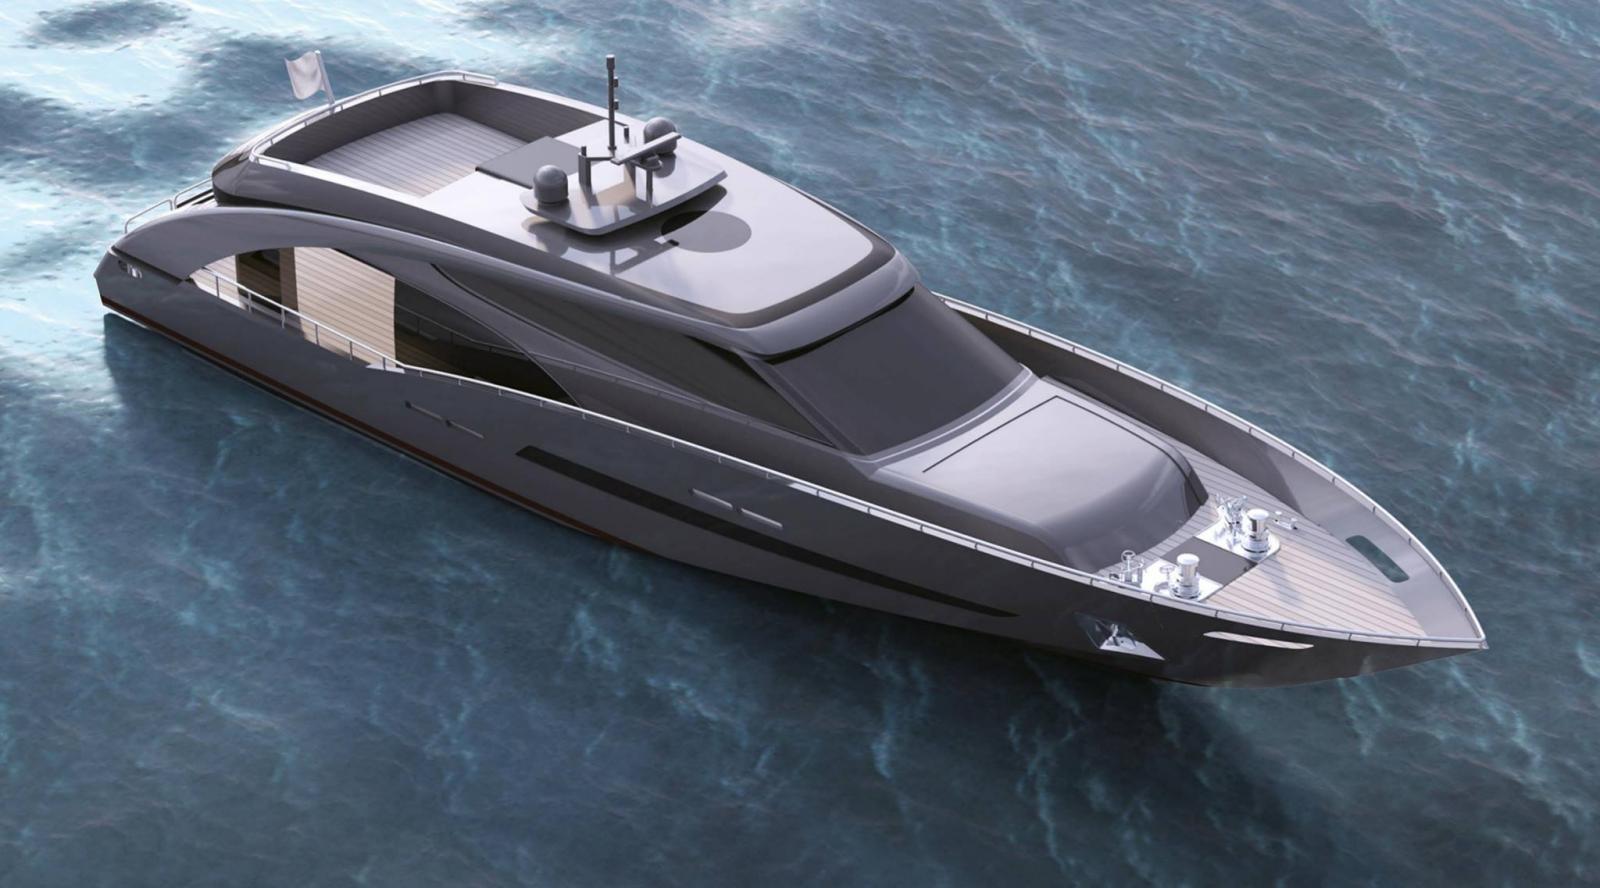 Freedom Cerri Cantiere Navali Yacht 27M